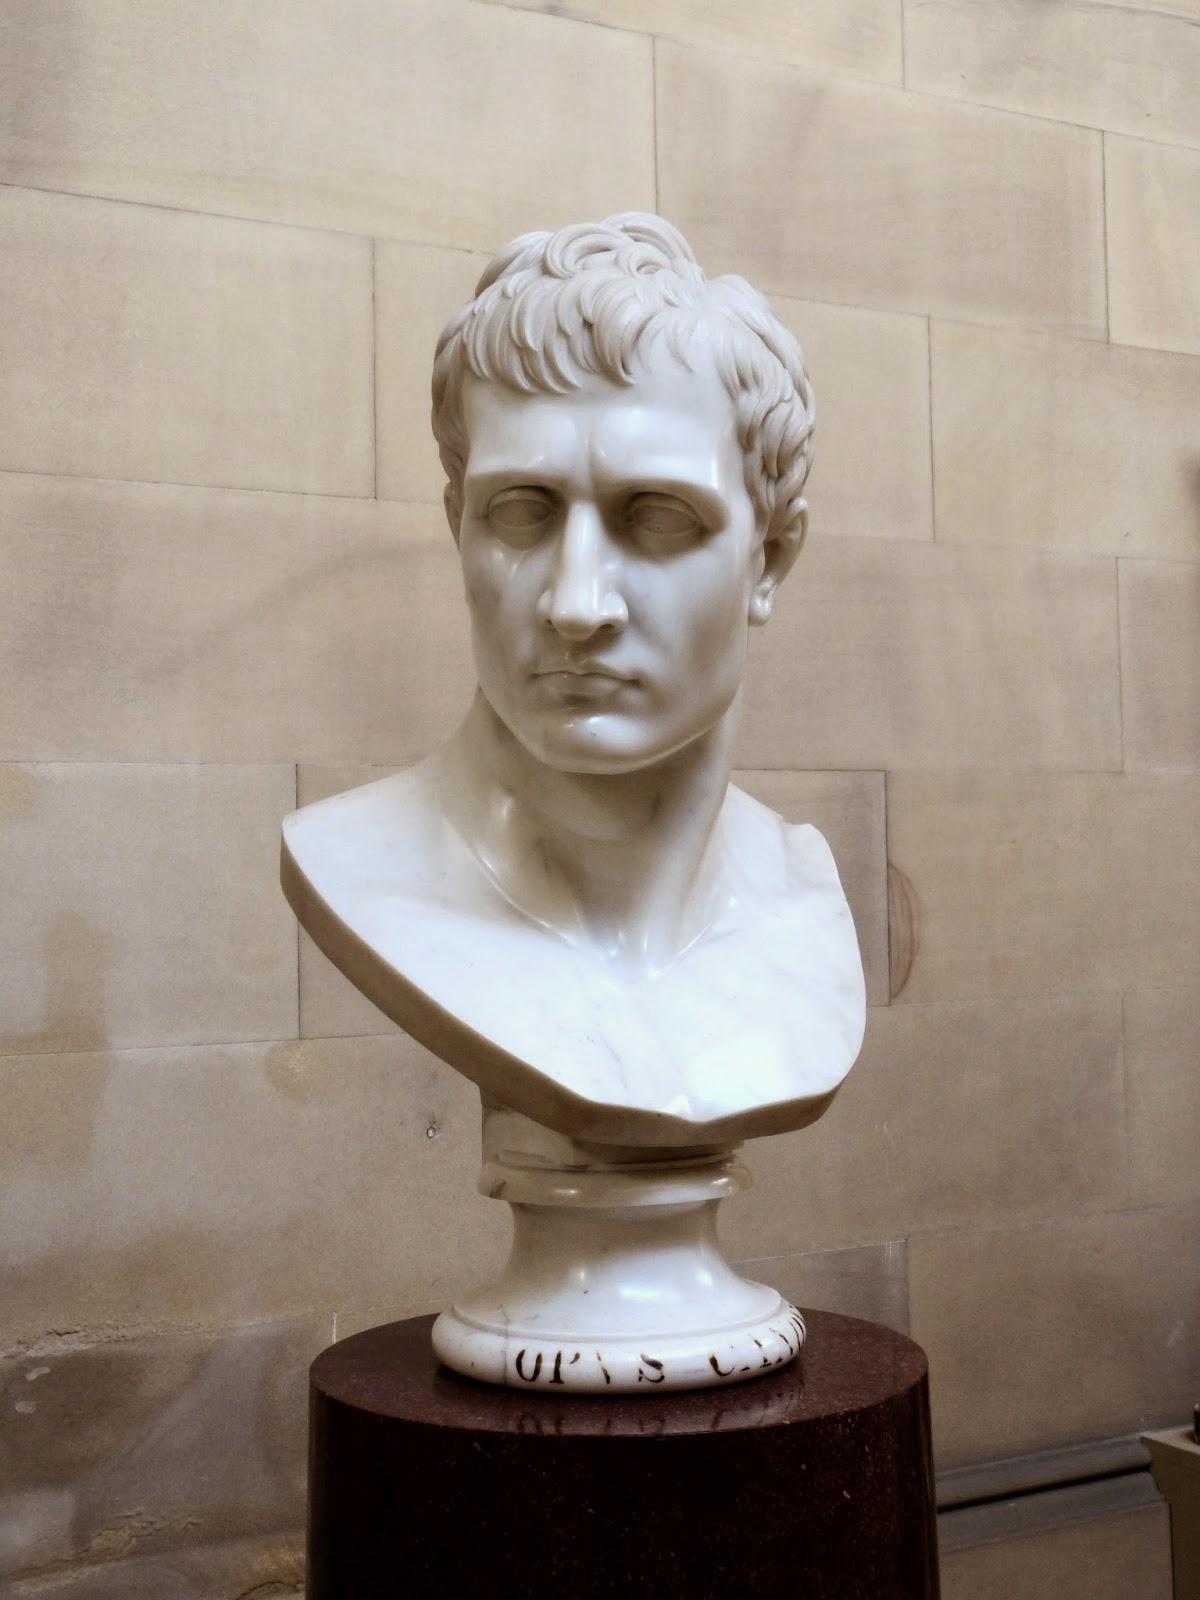 Bust of Napoleon by Antonio Canova